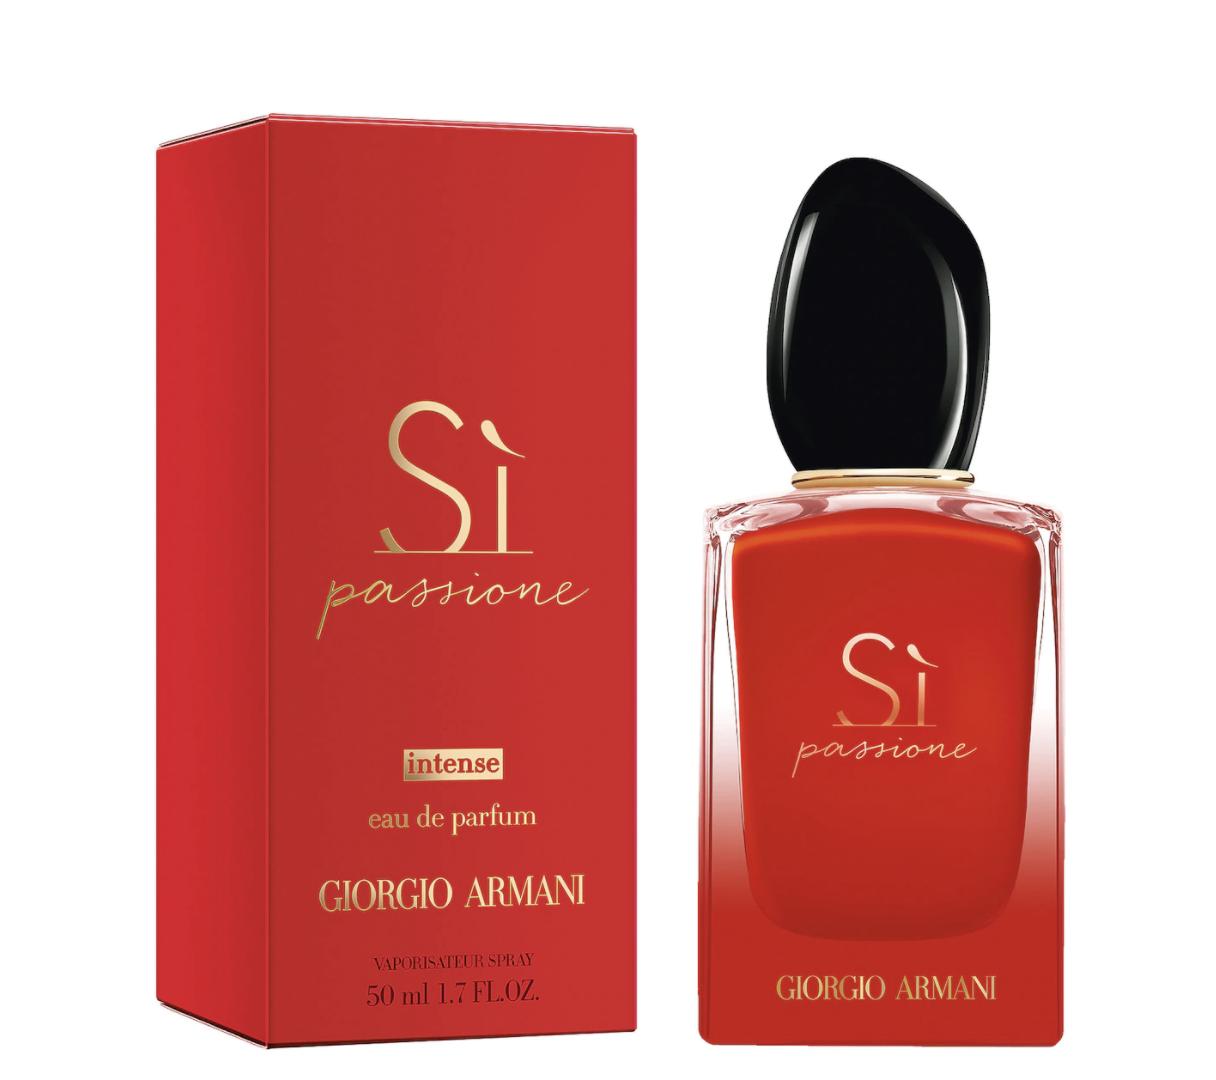 Giorgio Armani Beauty Si Passione Intense Eau de Parfum